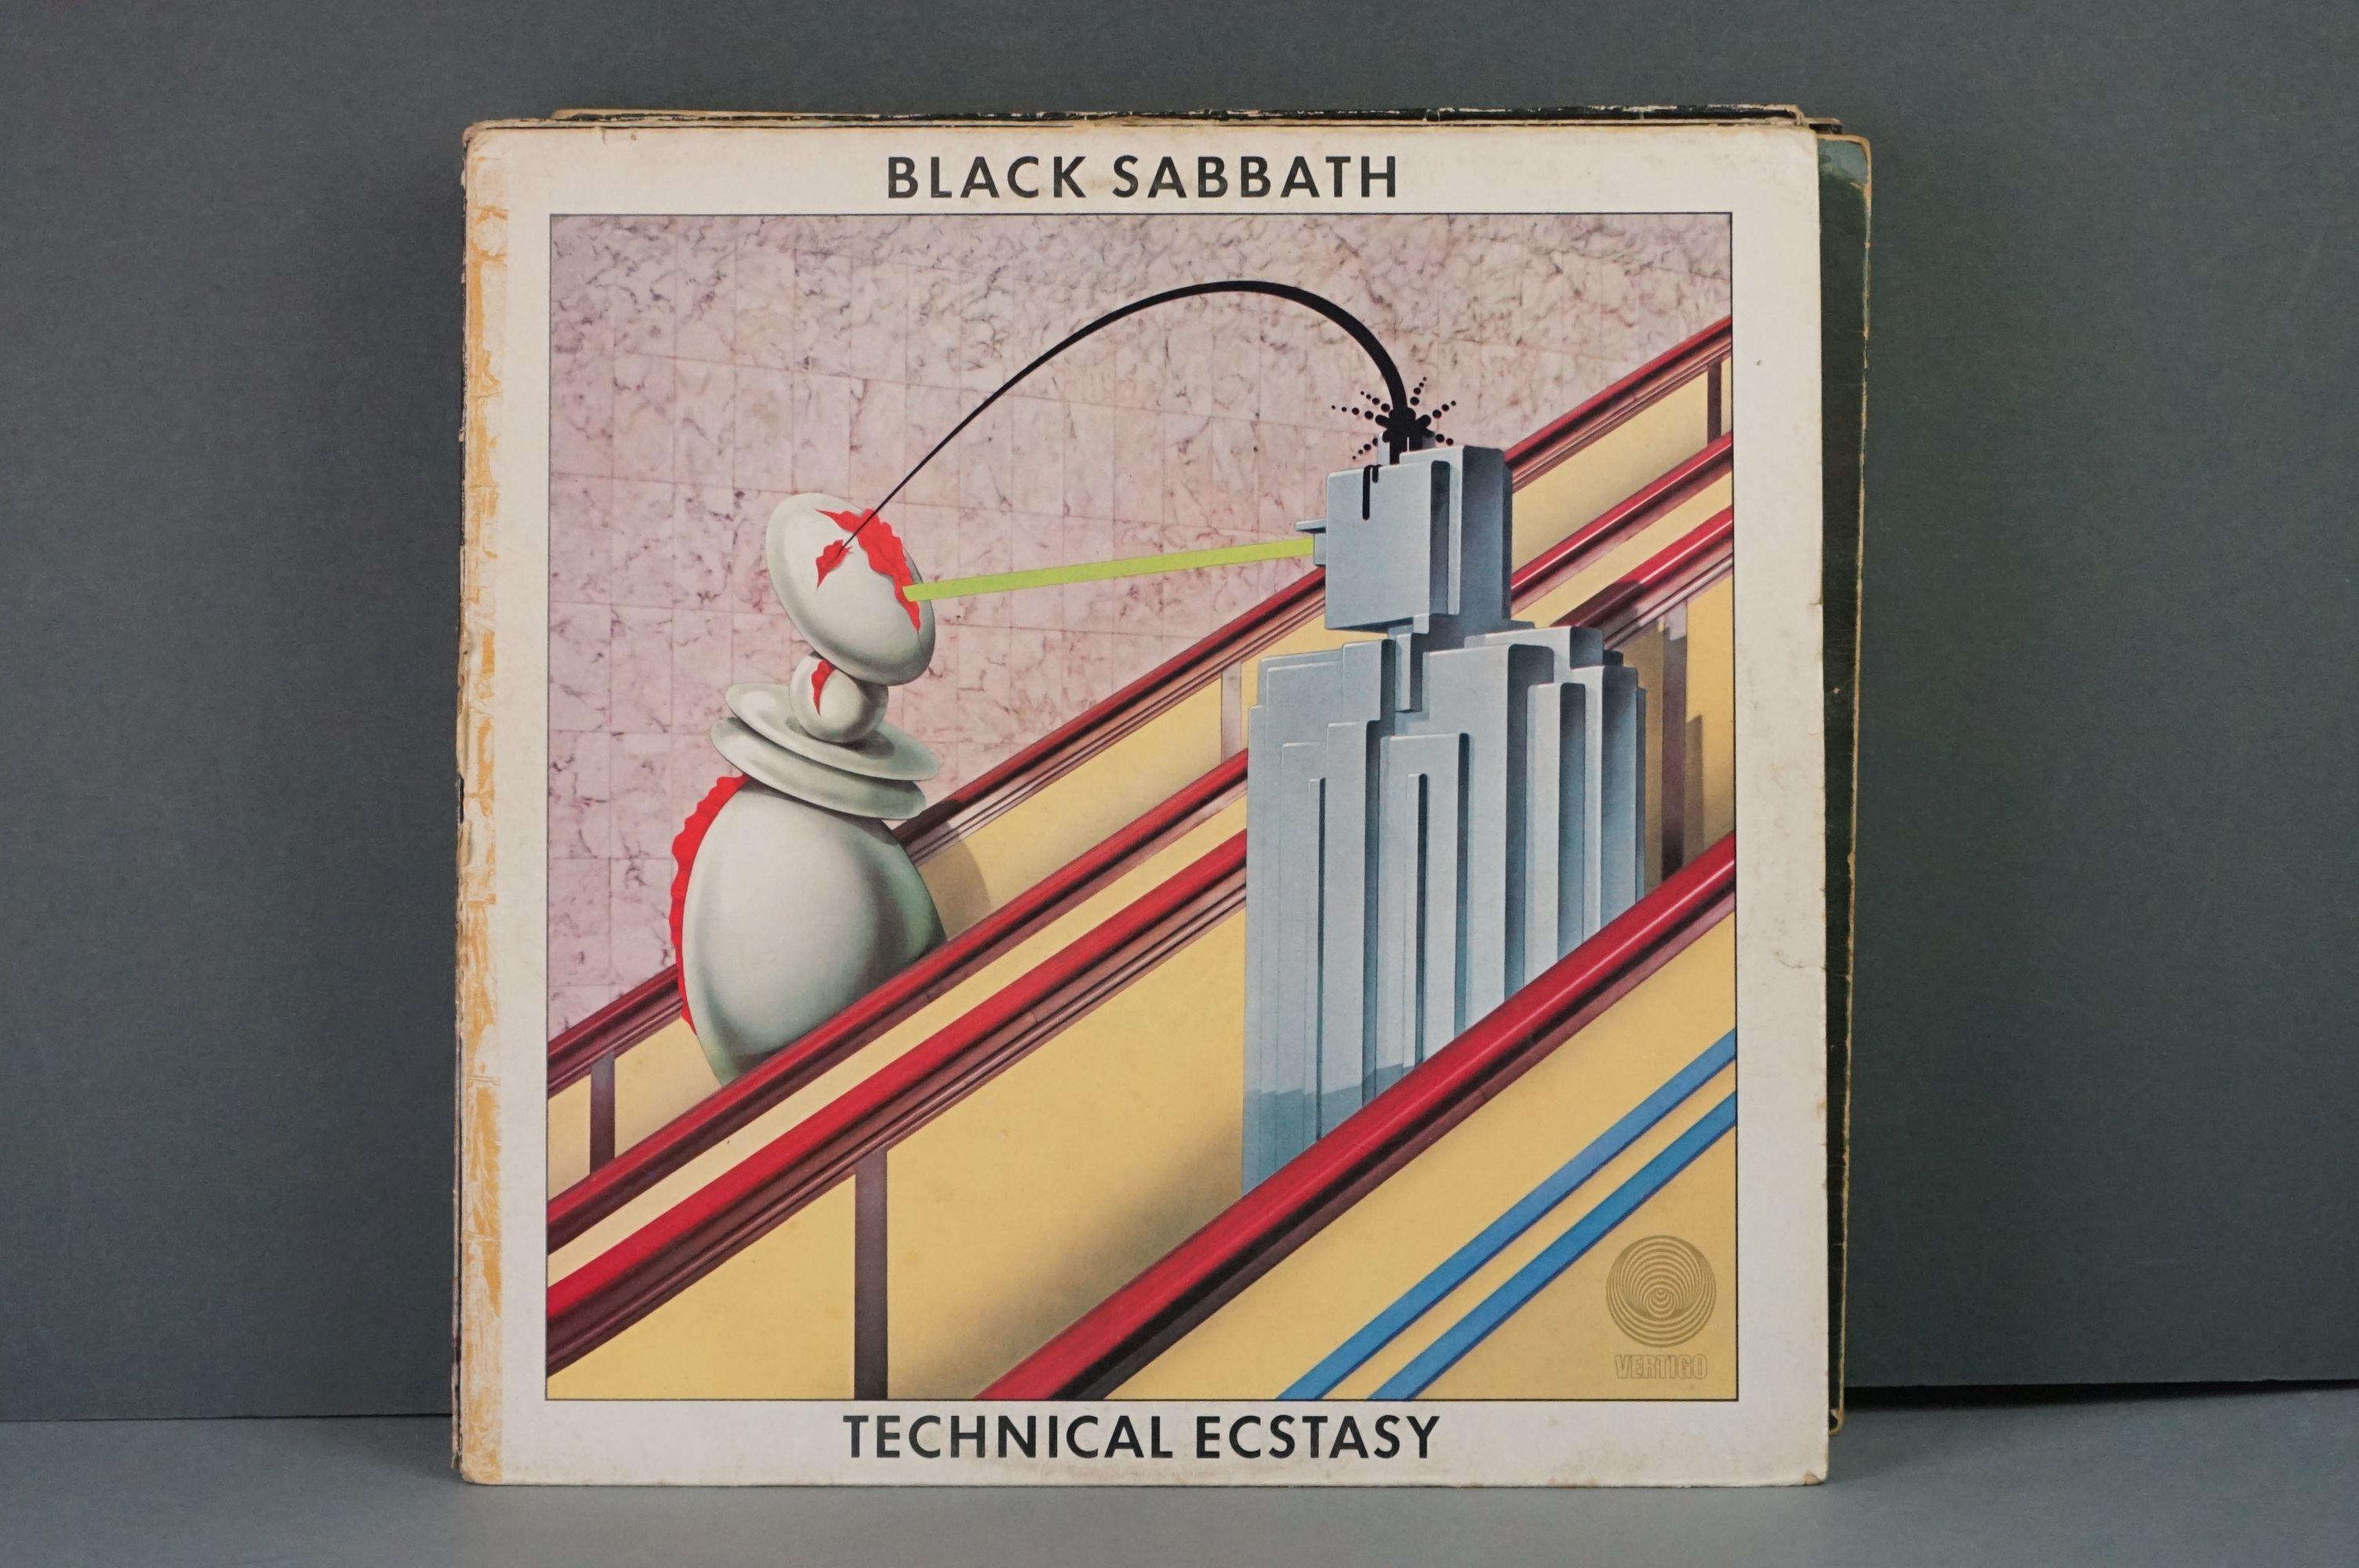 Vinyl - Twelve Black Sabbath vinyl LP's to include Technical Ecstasy (Vertigo Records PRICE 40), - Image 2 of 17